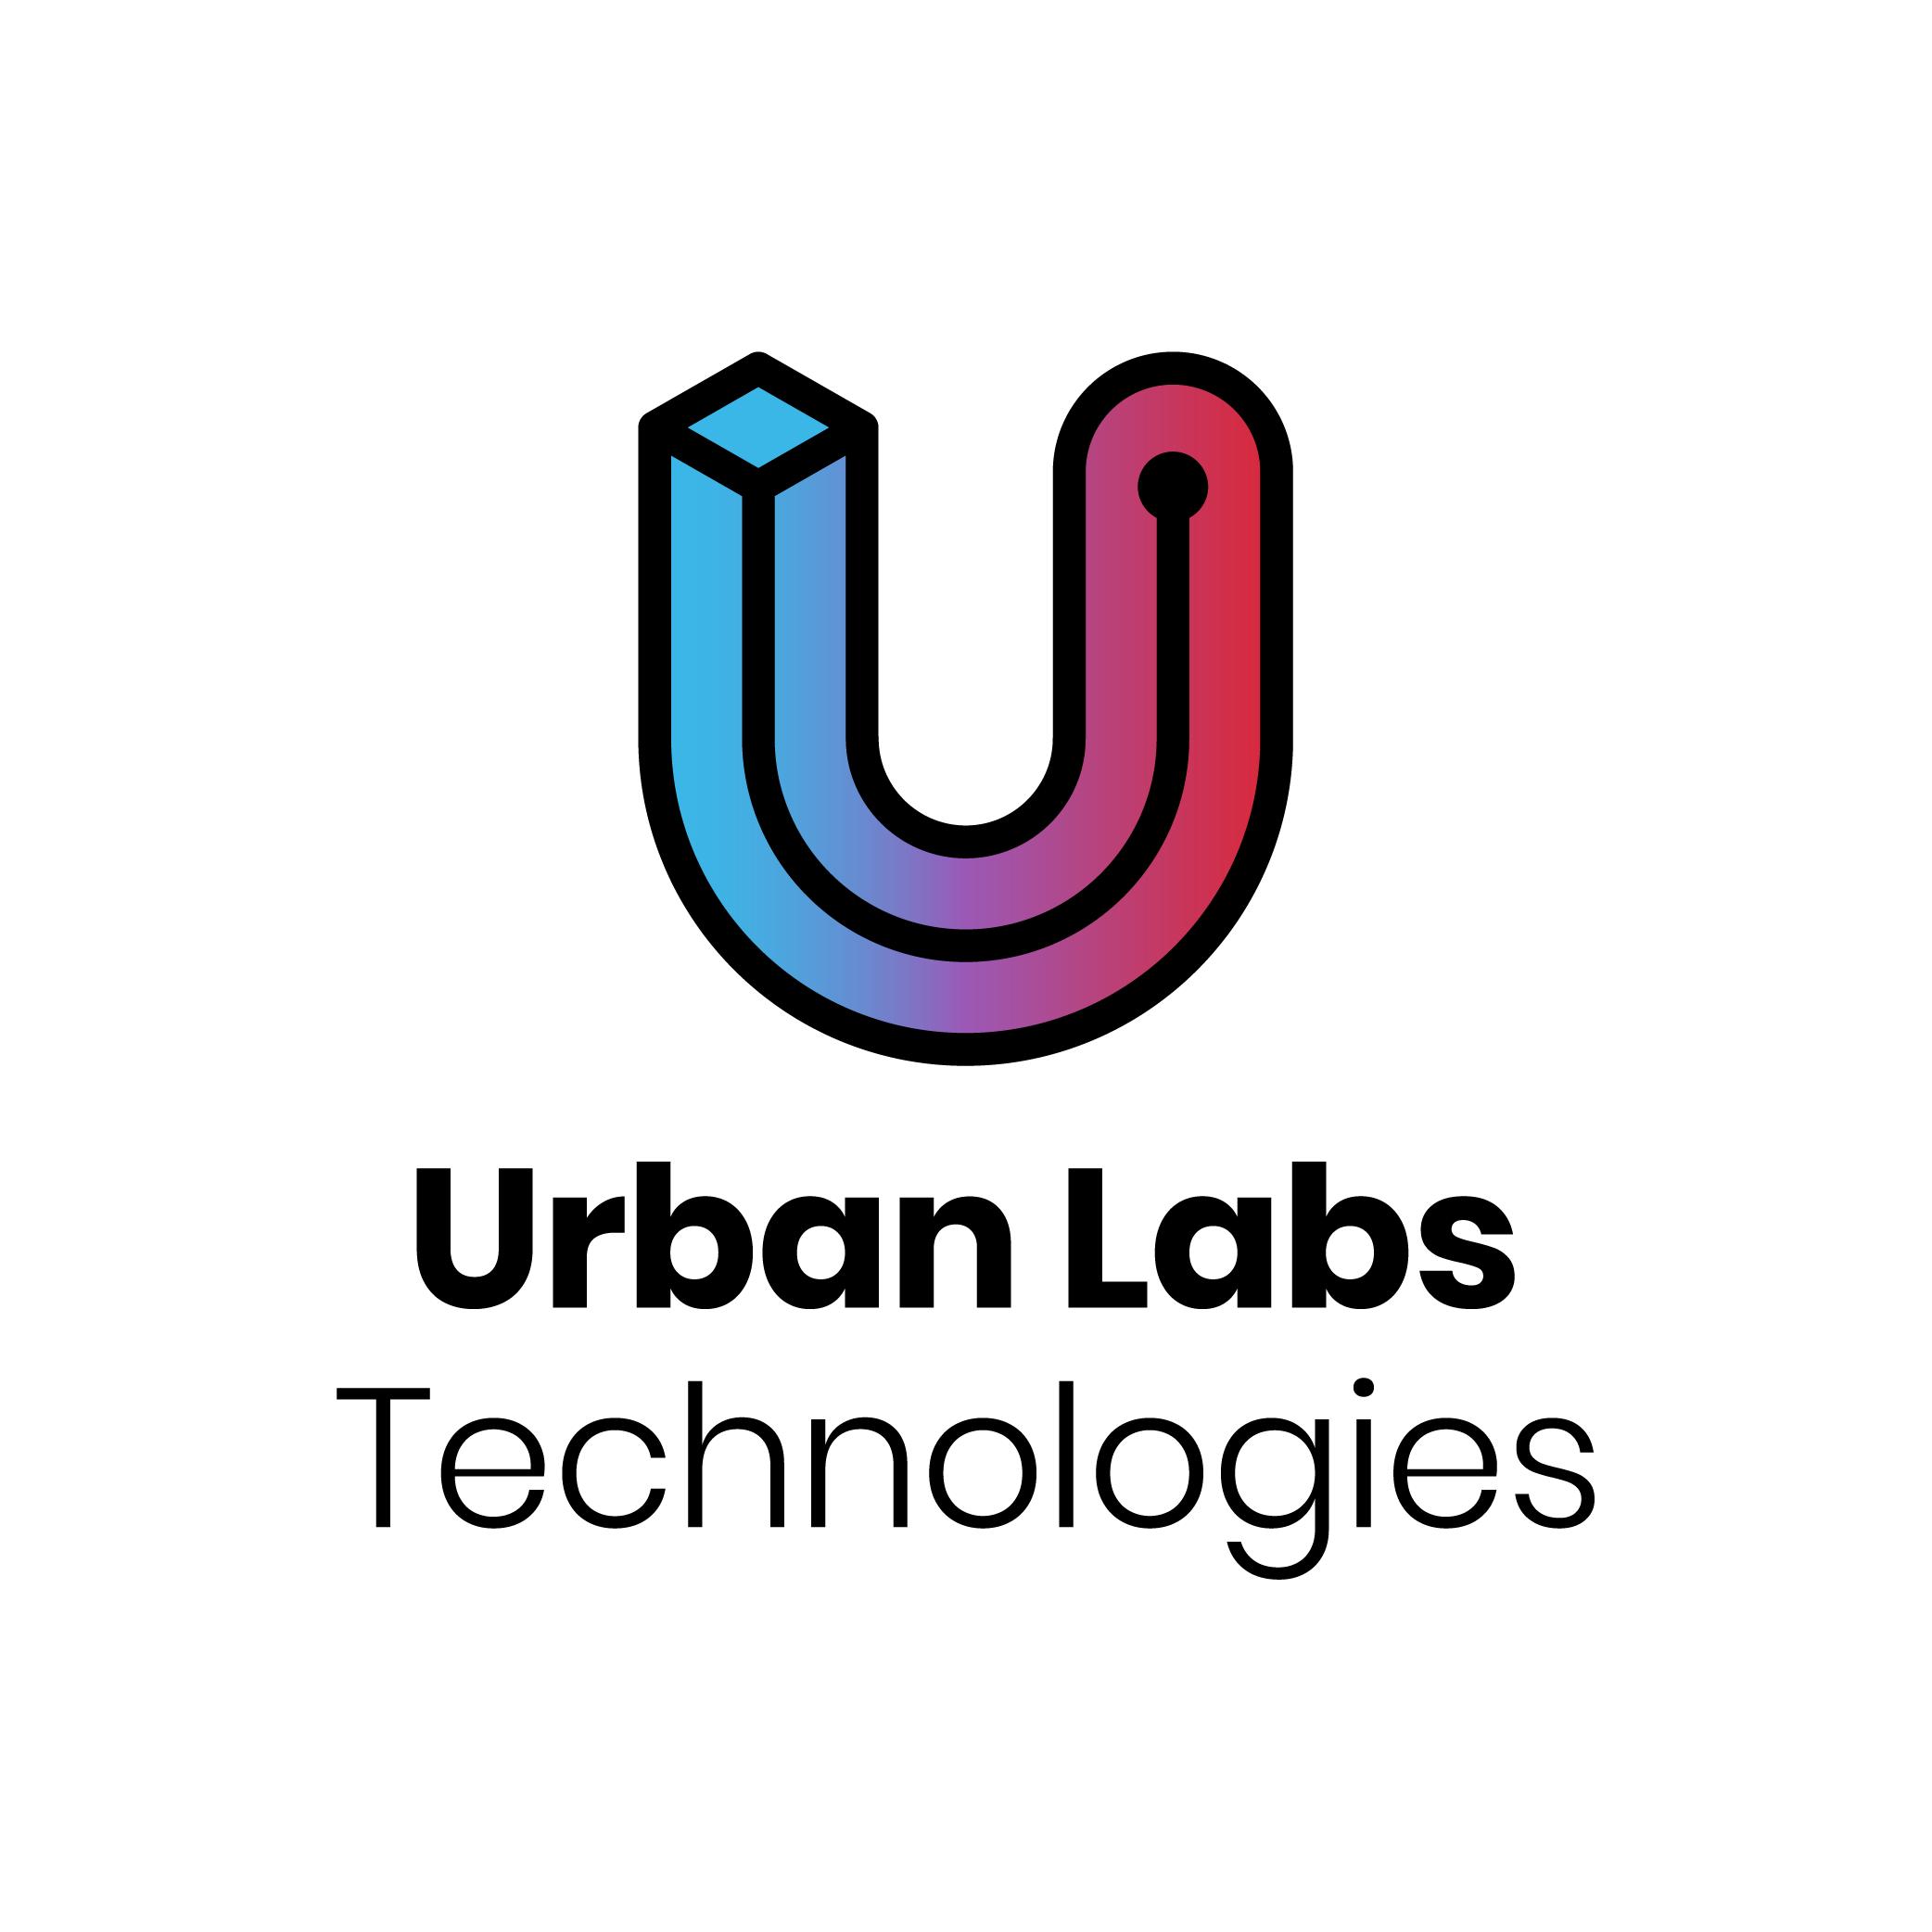 Urban Labs Technologies